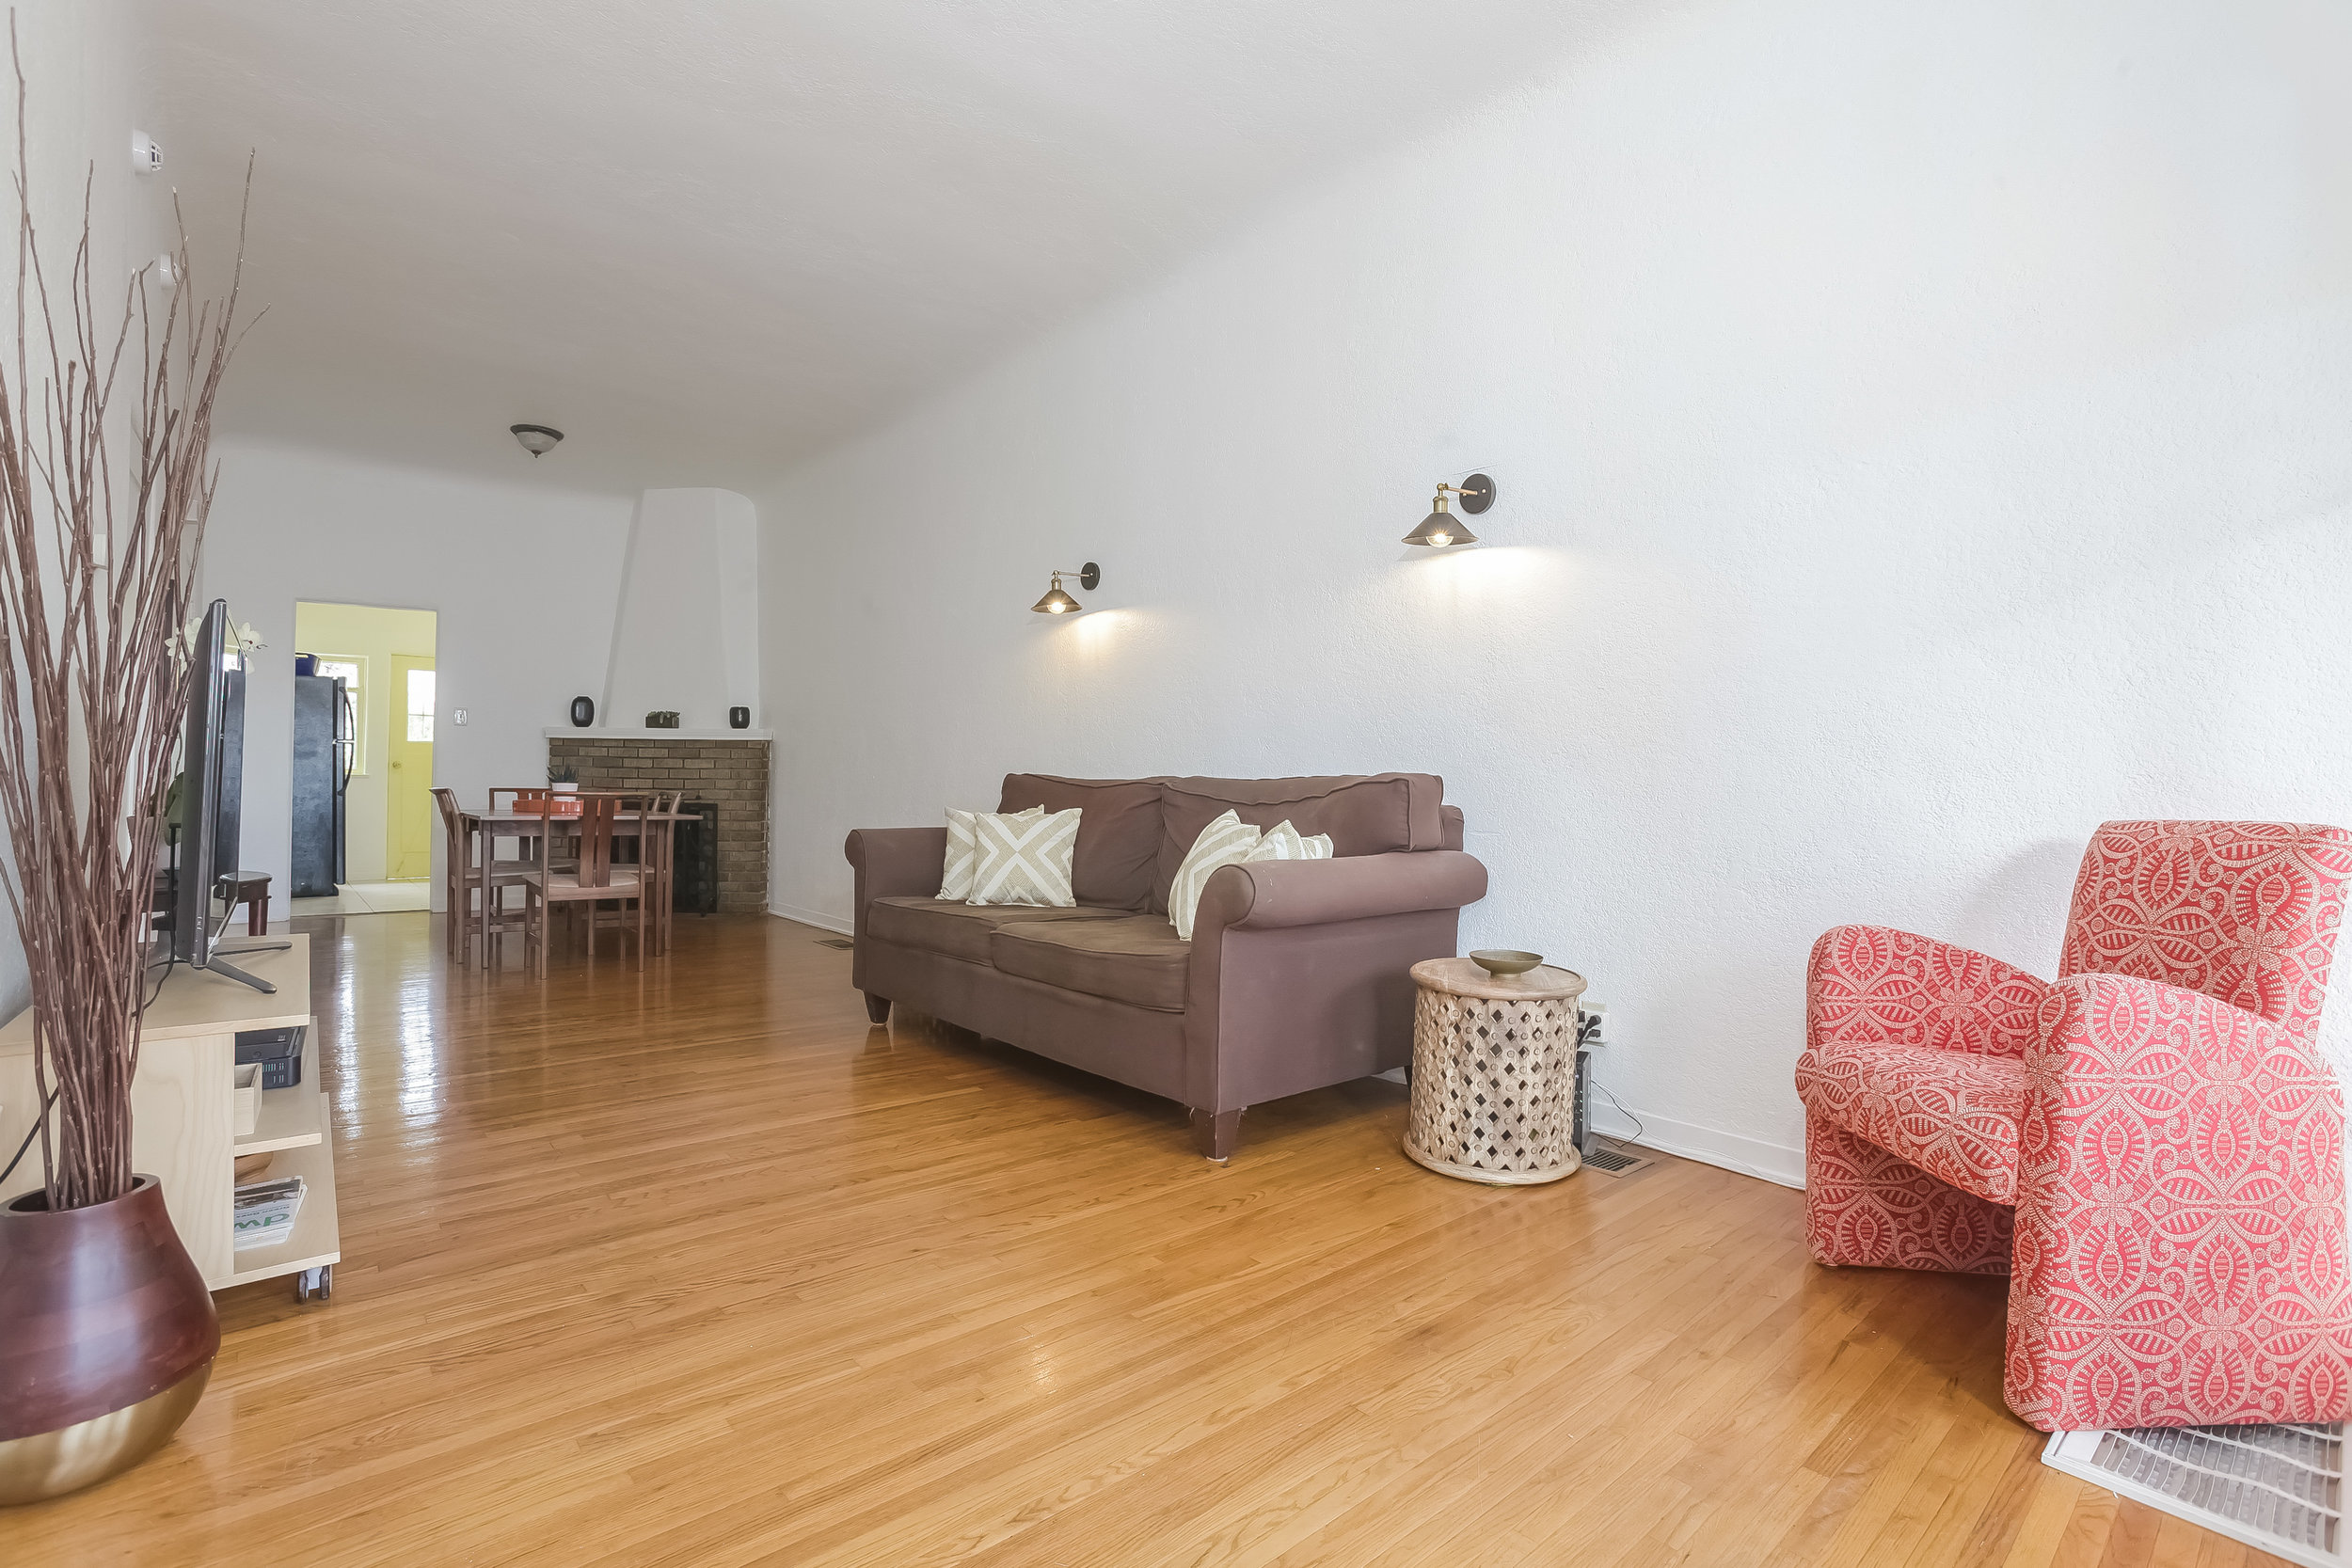 006-Living_Room-4517246-large.jpg